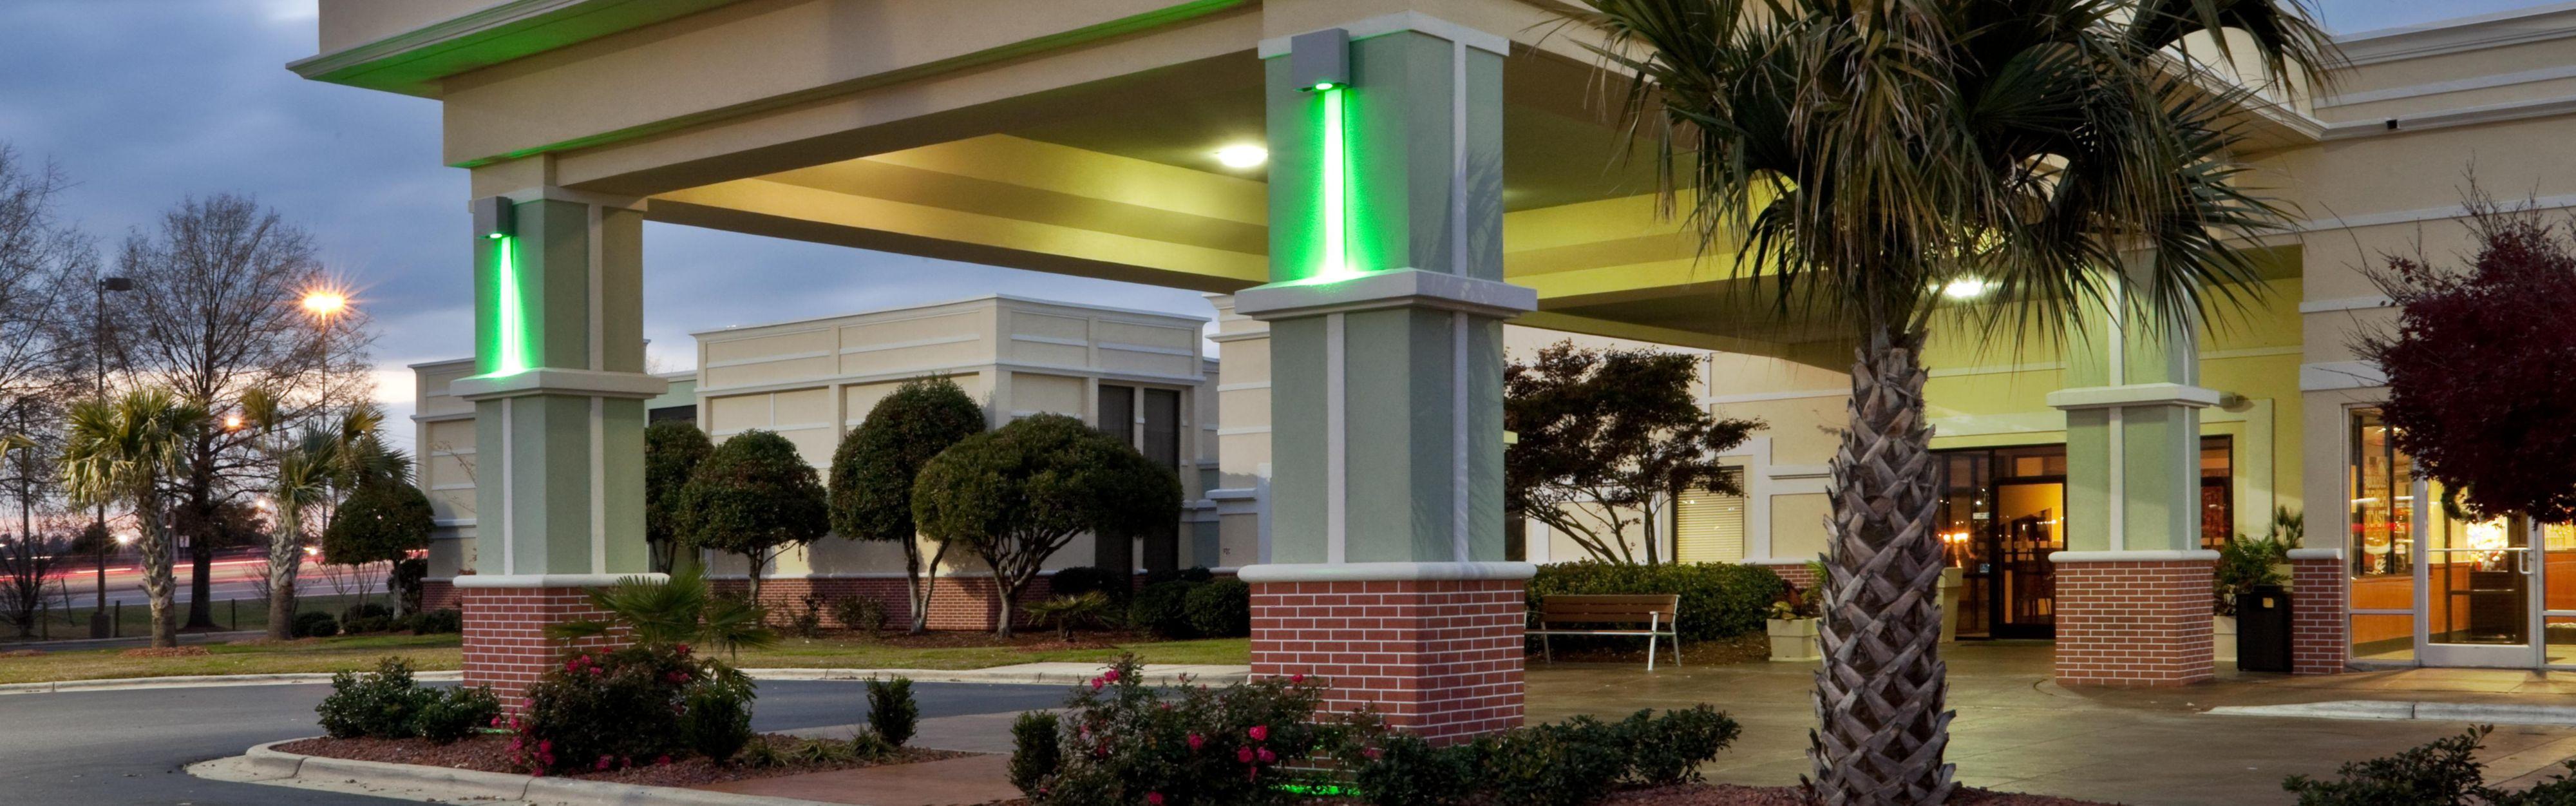 Holiday Inn Lumberton North - I-95 image 0